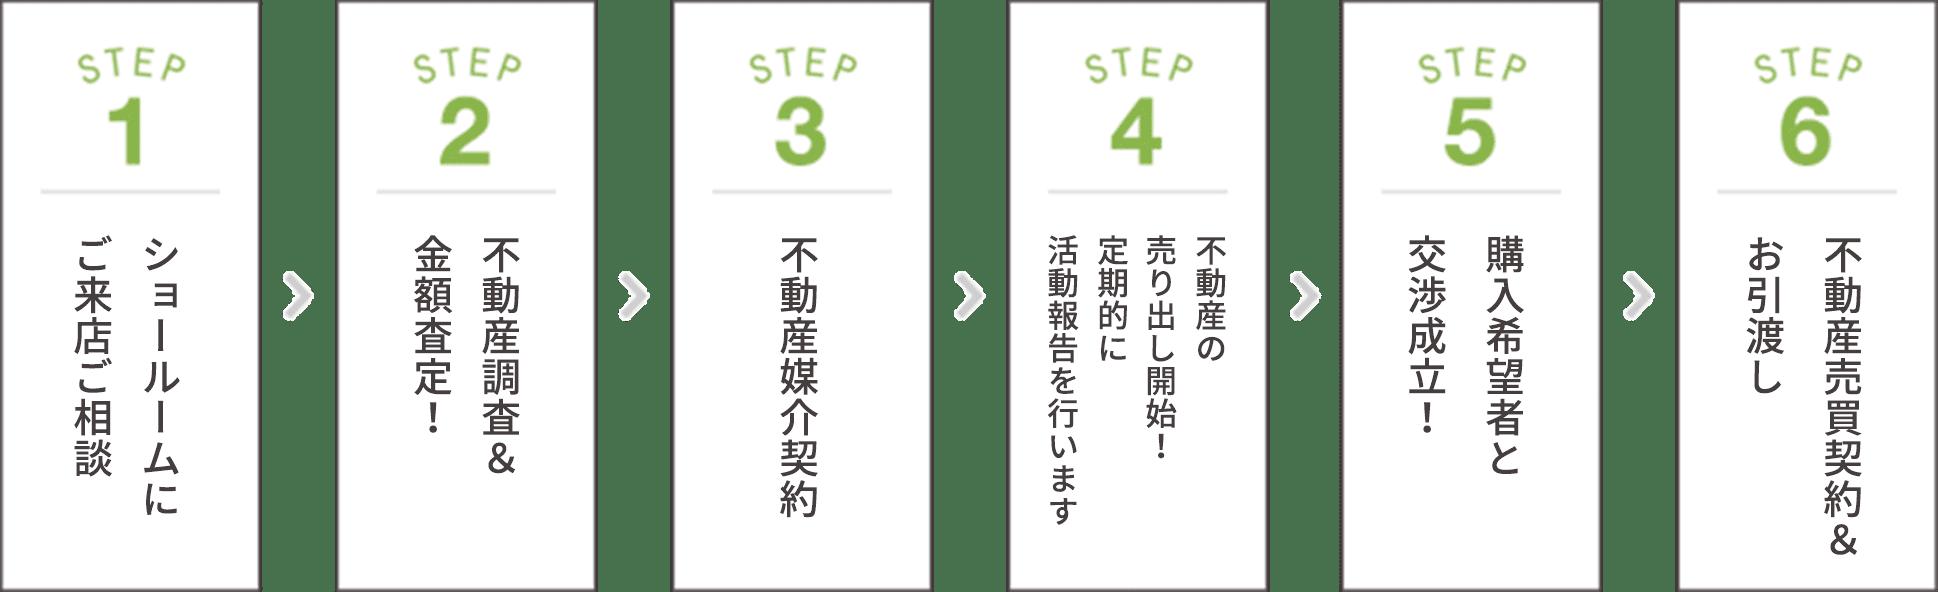 STEP1ショールームにご来店ご相談、STEP2不動産調査&金額査定!、STEP3不動産媒介契約、STEP4不動産の売り出し開始!、STEP5購入希望者と交渉成立!、STEP6不動産売買契約&お引渡し